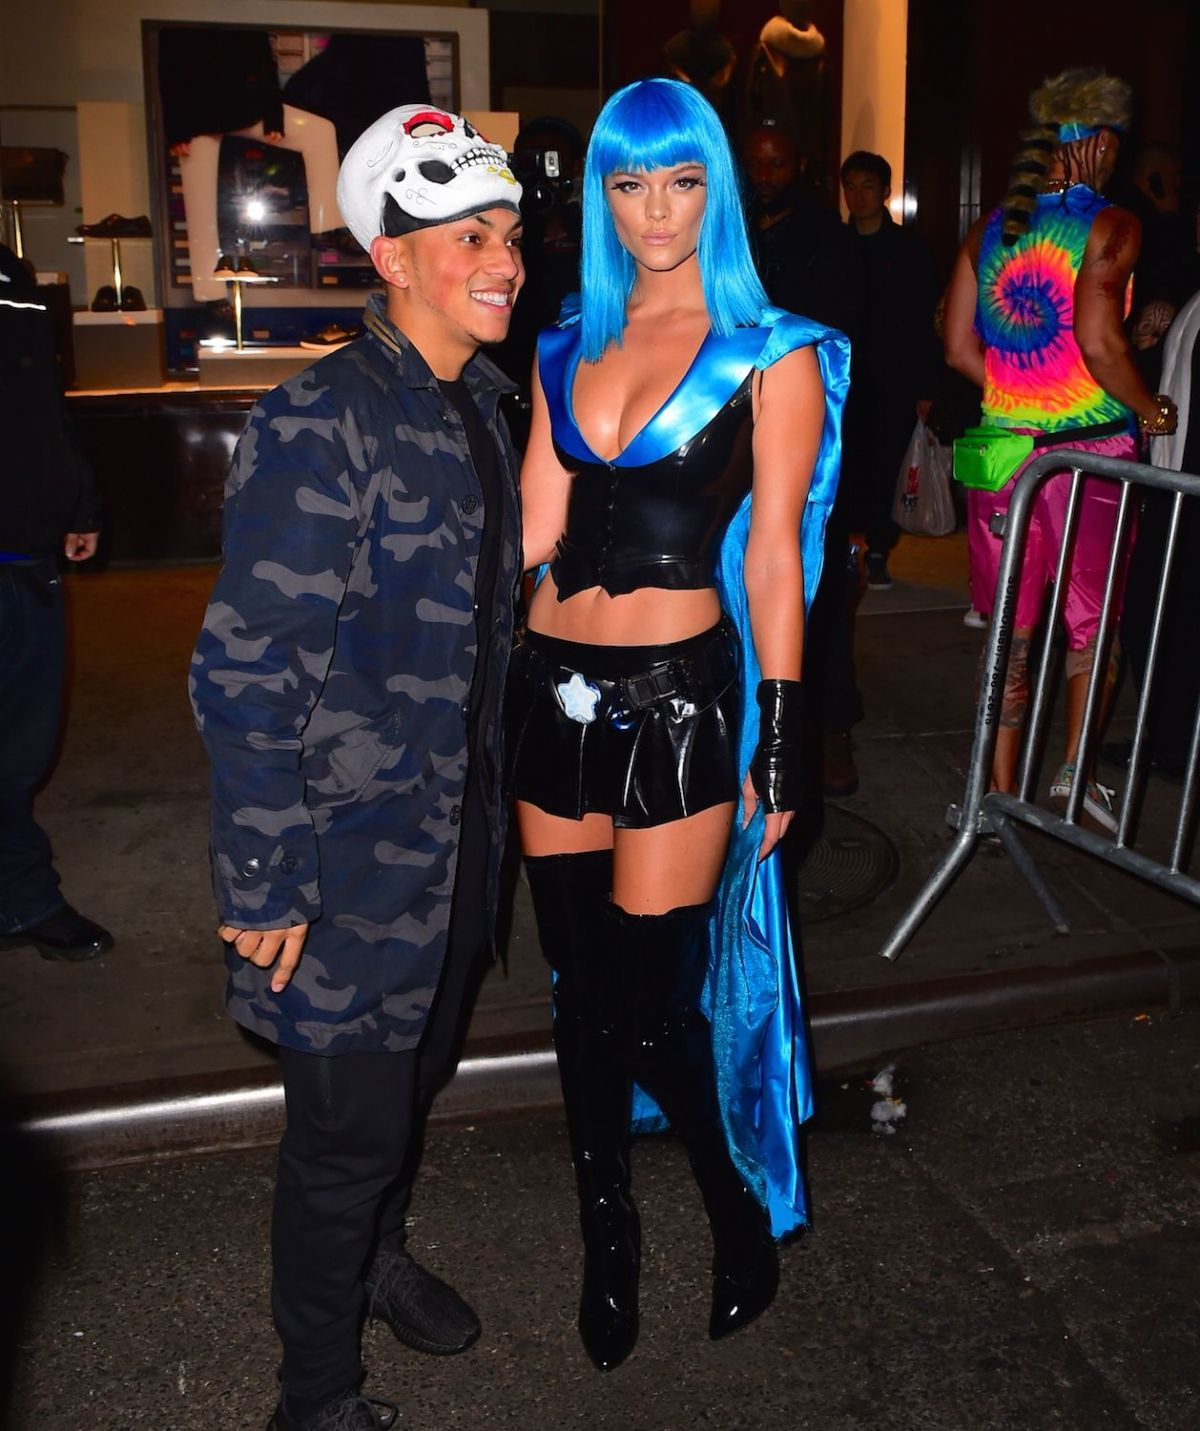 NINA AGDAL at Heidi Klum Halloween Party in New York 10/31/2015 ...